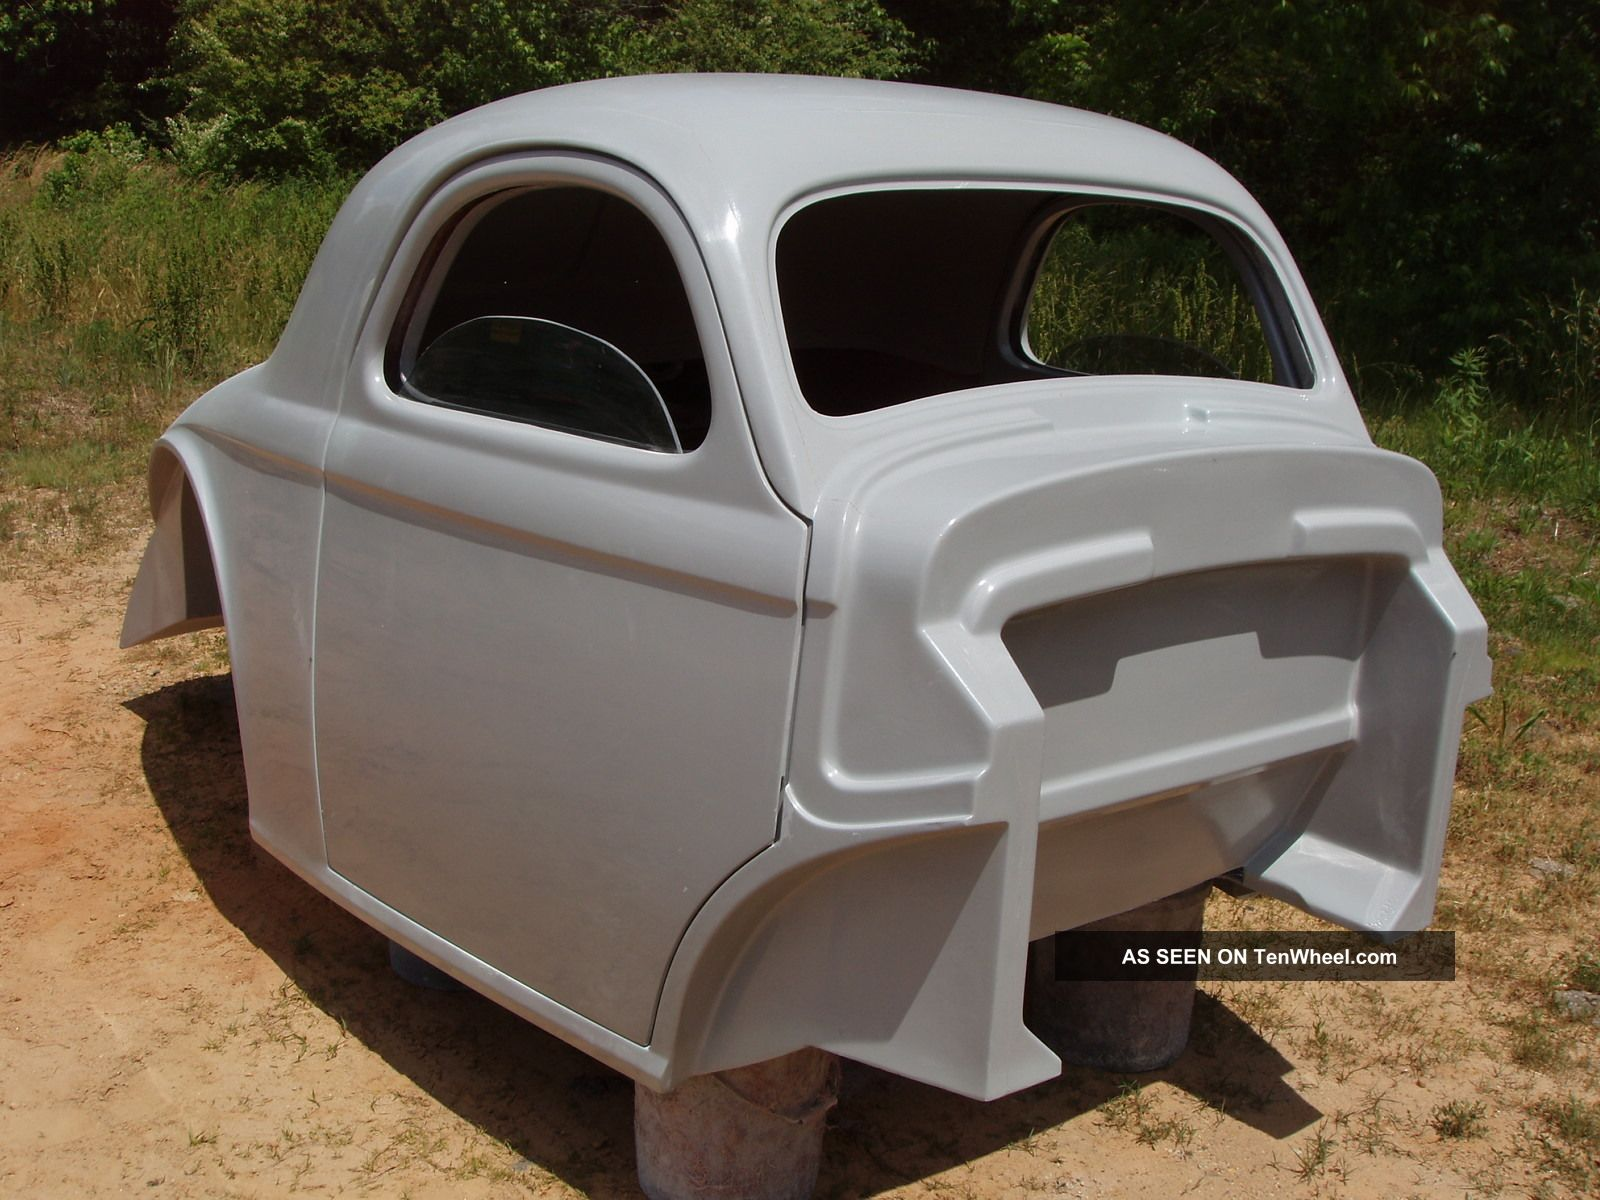 1941 Willys Coupe Rat Hot Street Rod Fiberglass Body Pro Street Willys photo